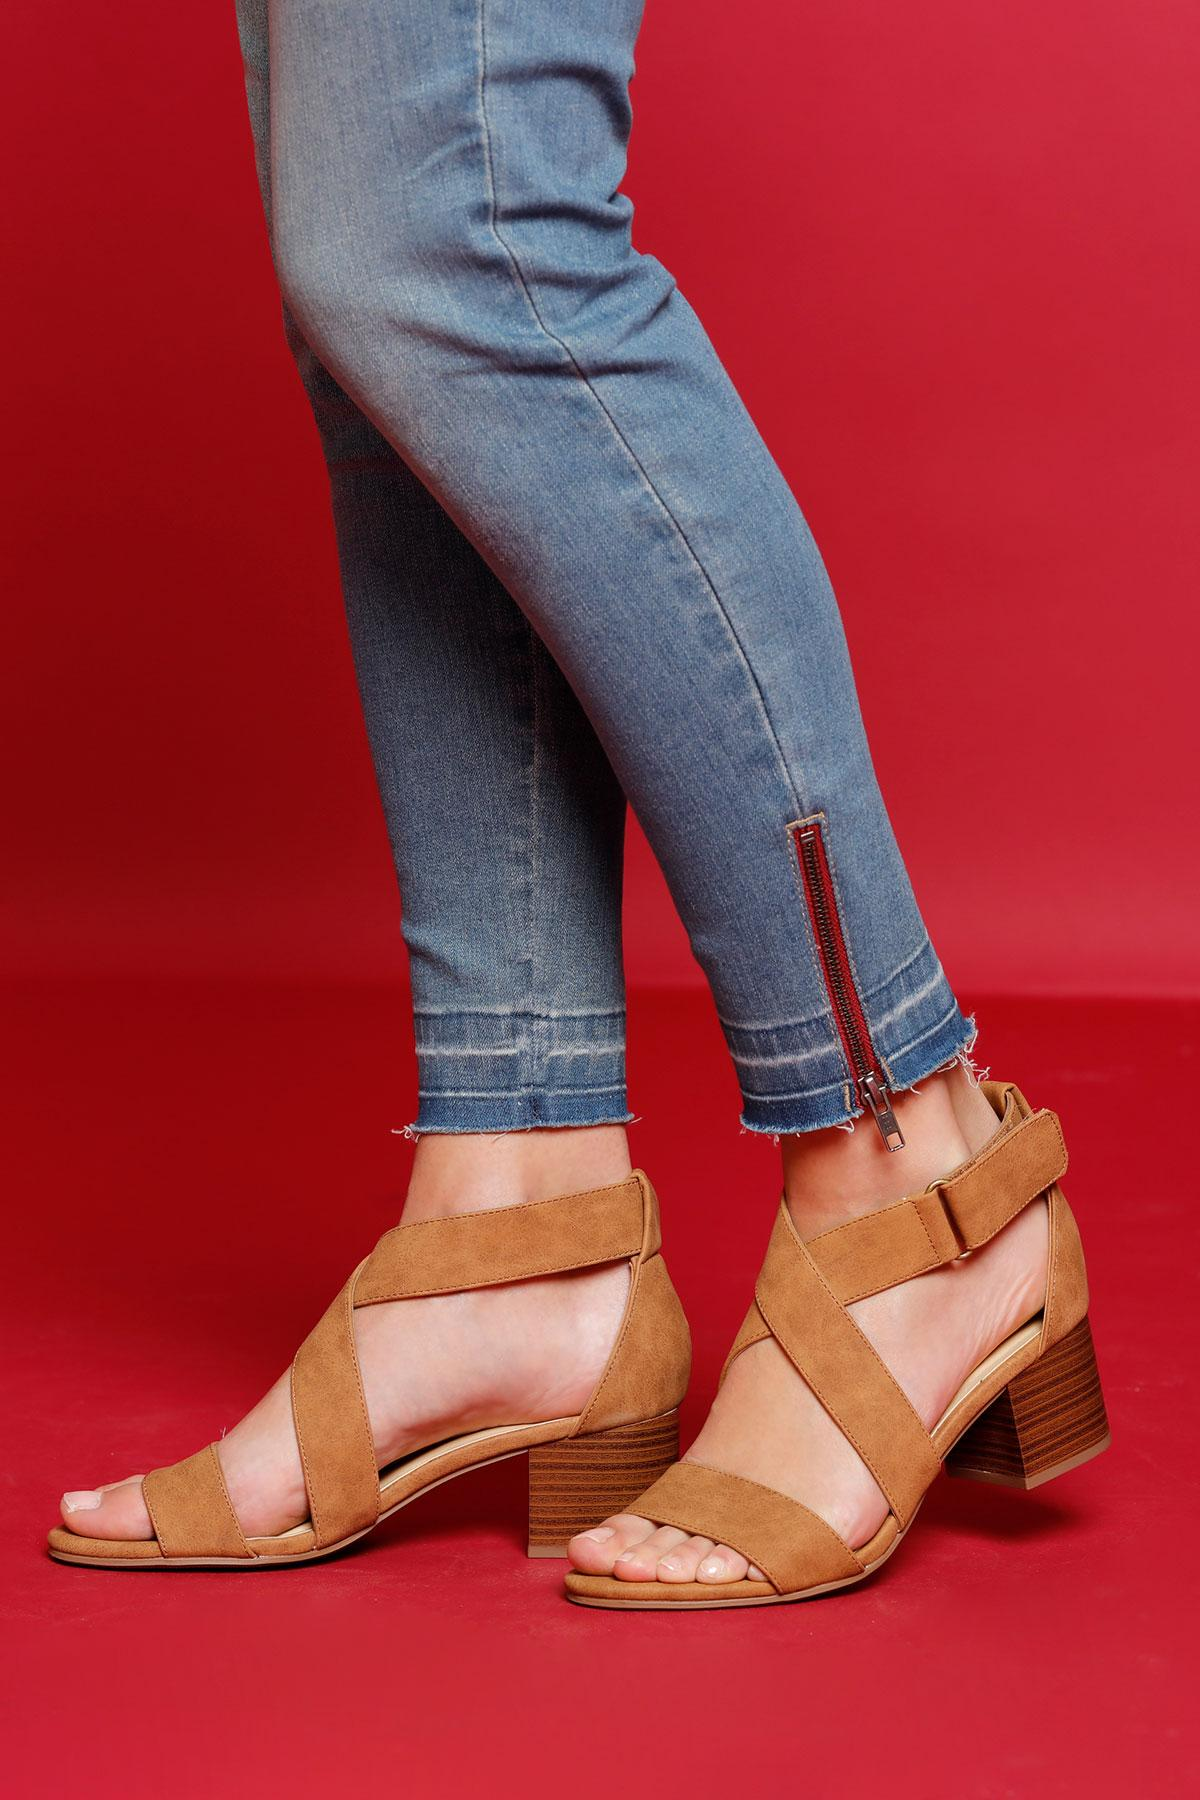 Cross Strap Heeled Sandals